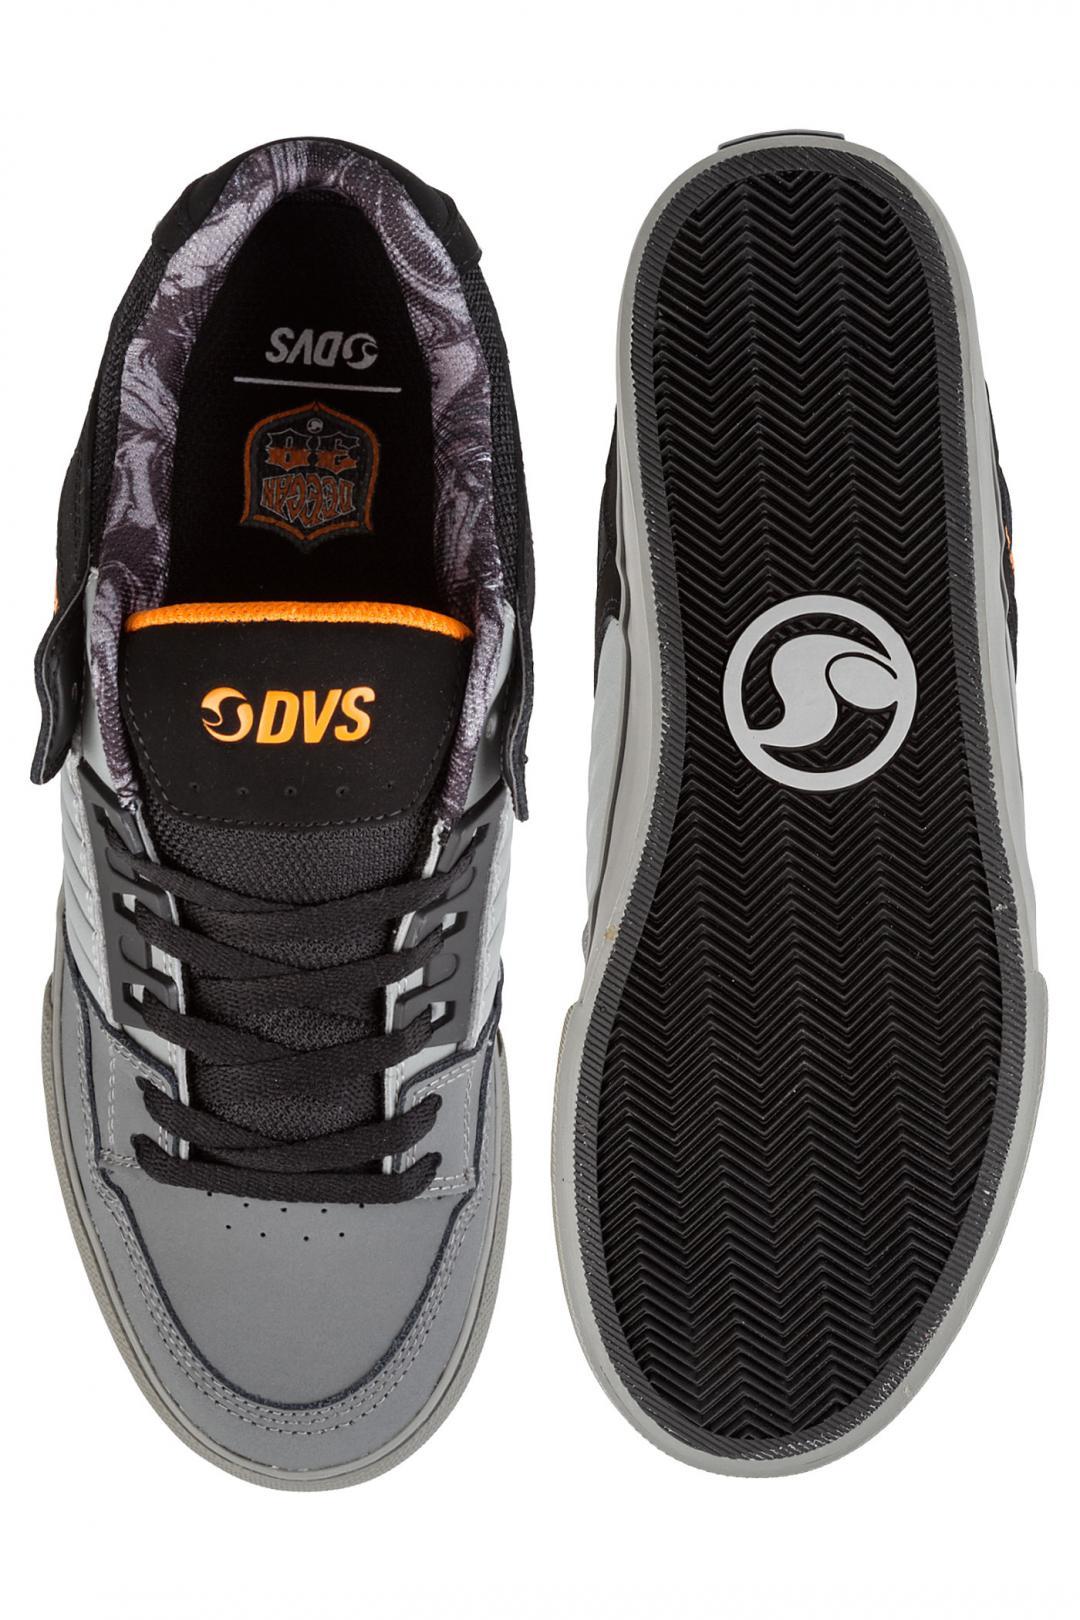 Uomo DVS Celsius CT Nubuck charcoal grey black deegan | Sneakers low top